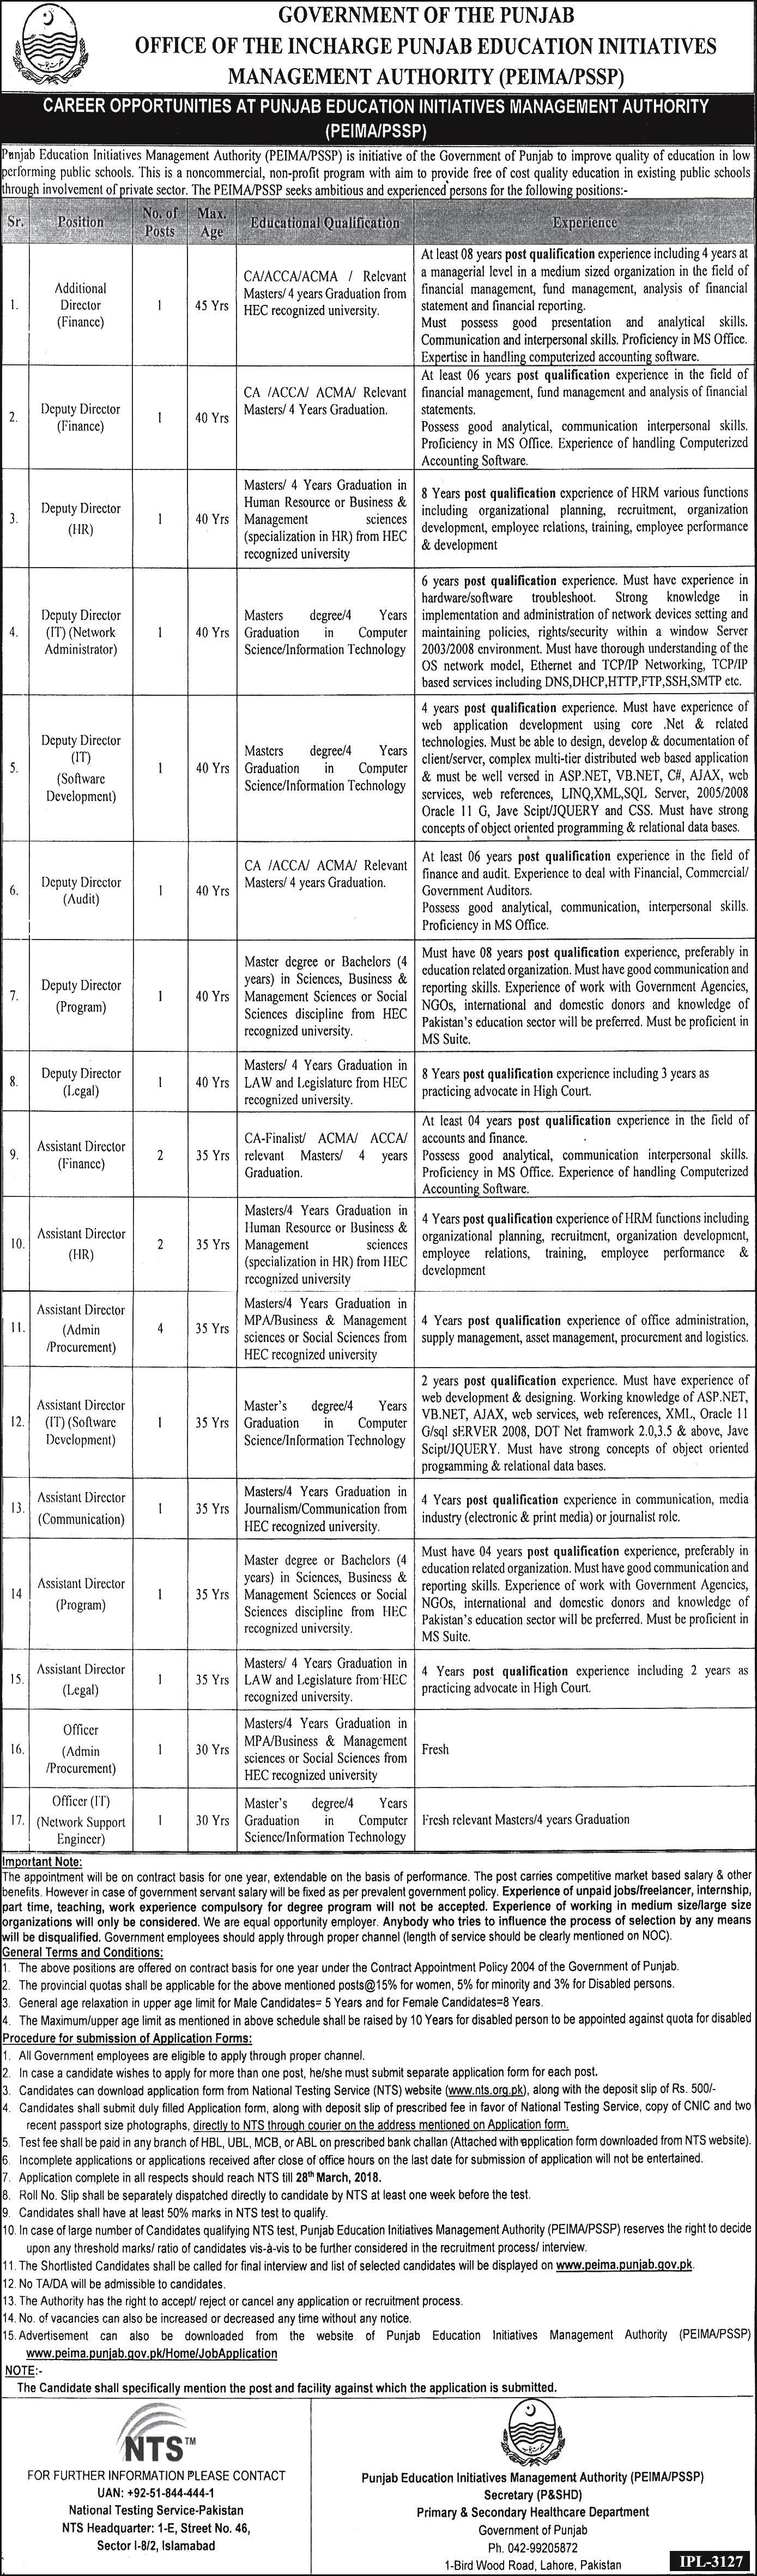 Punjab Education Initiative Management Authority PEIMA/PSSP Jobs March 2018 Online NTS Application Form Test Preparation